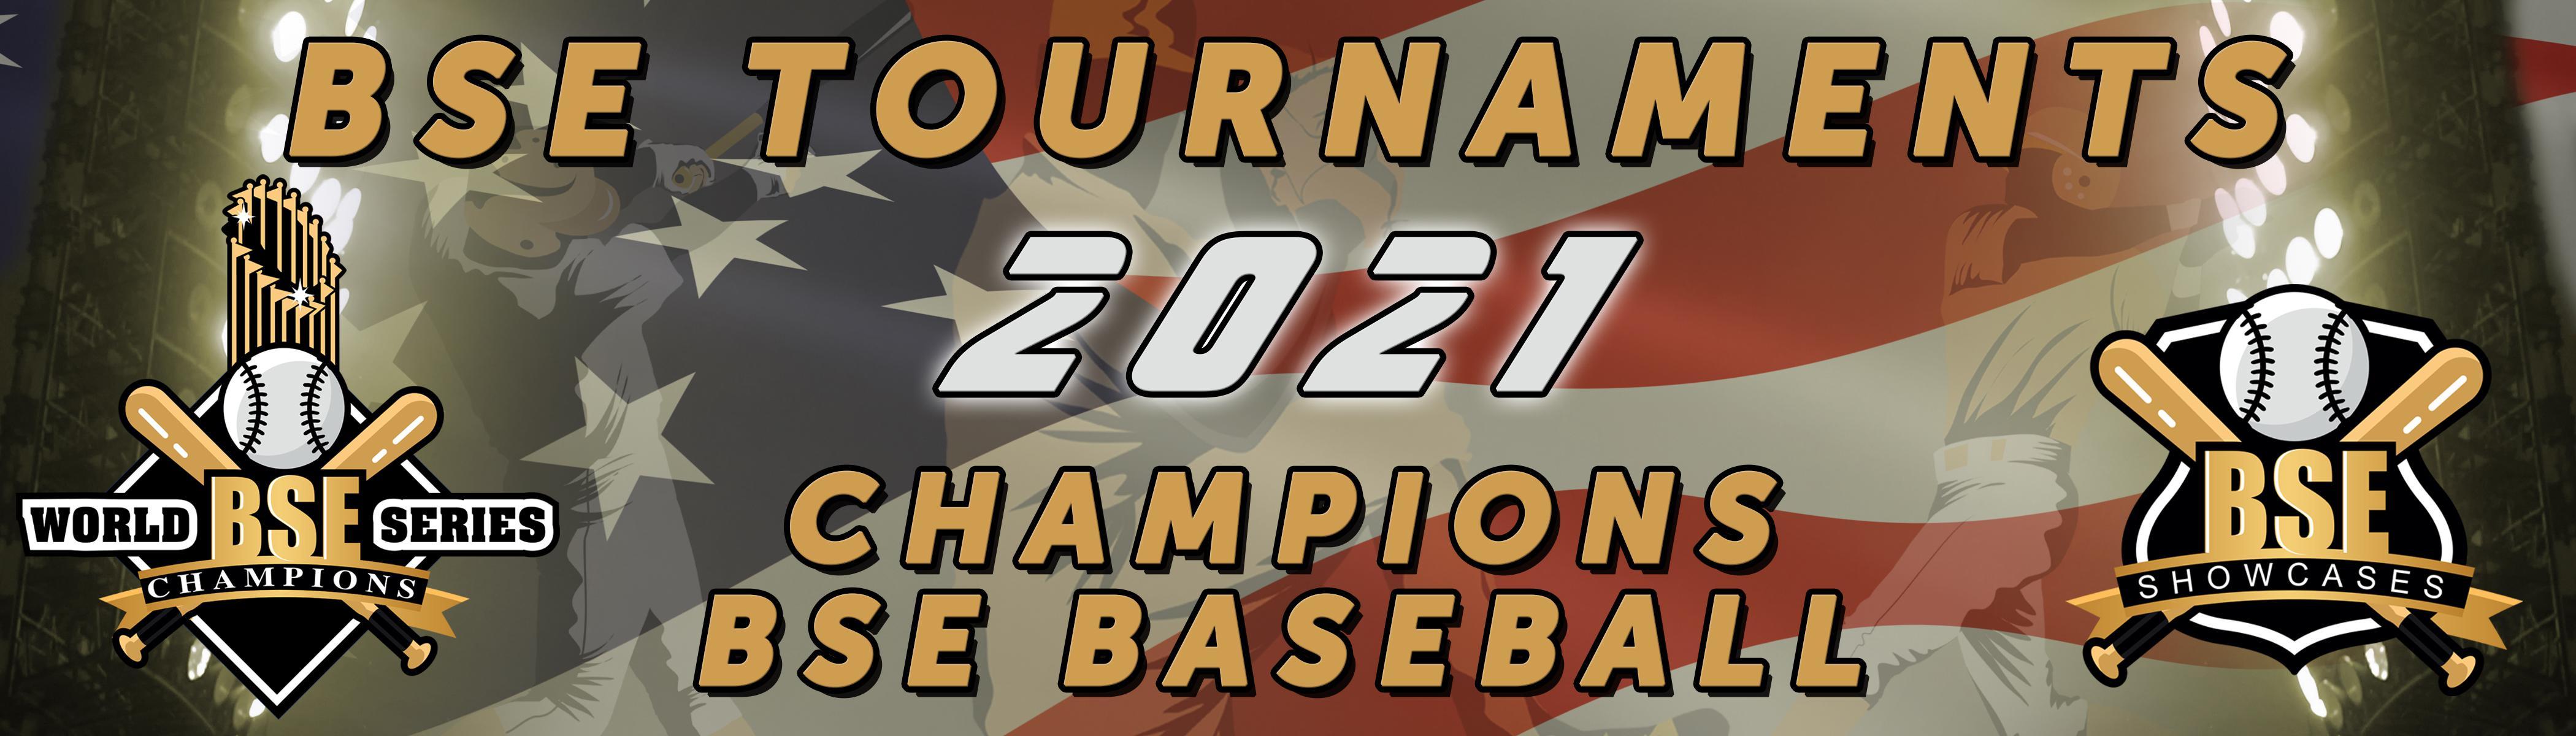 2021 tournament website header